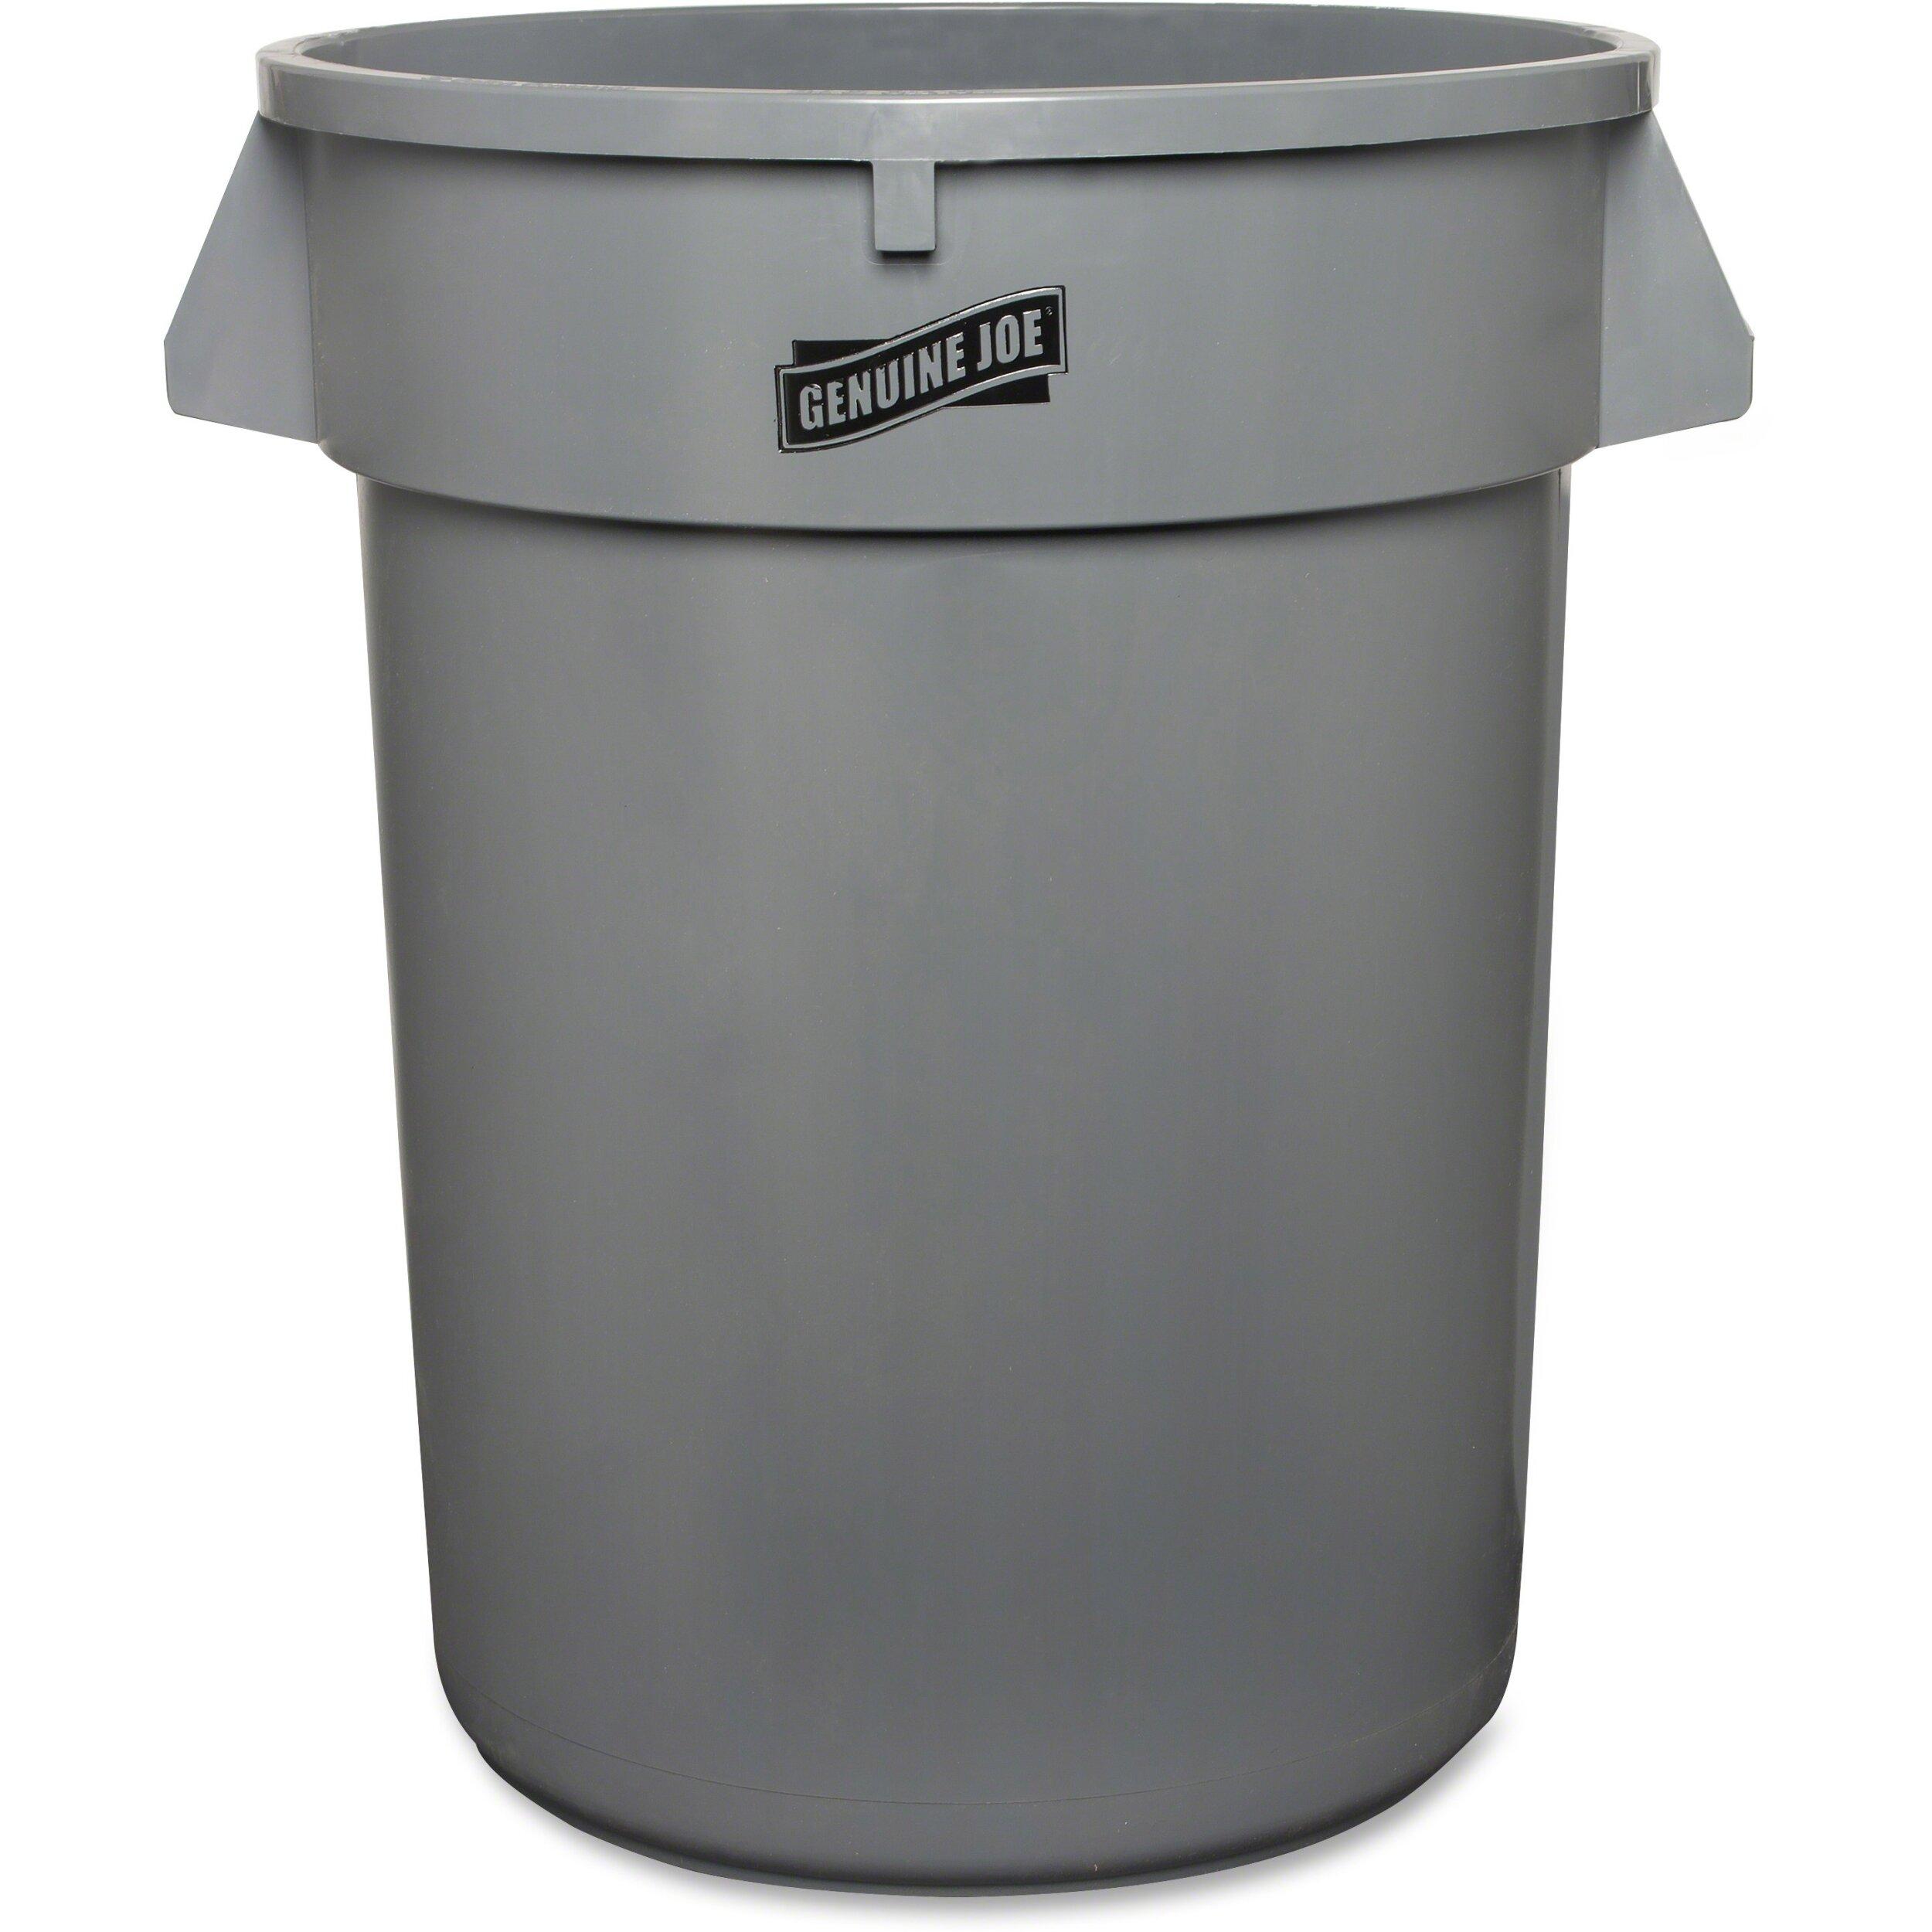 def4366ff81 Genuine Joe Heavy Duty 32 Gallon Trash Can   Reviews